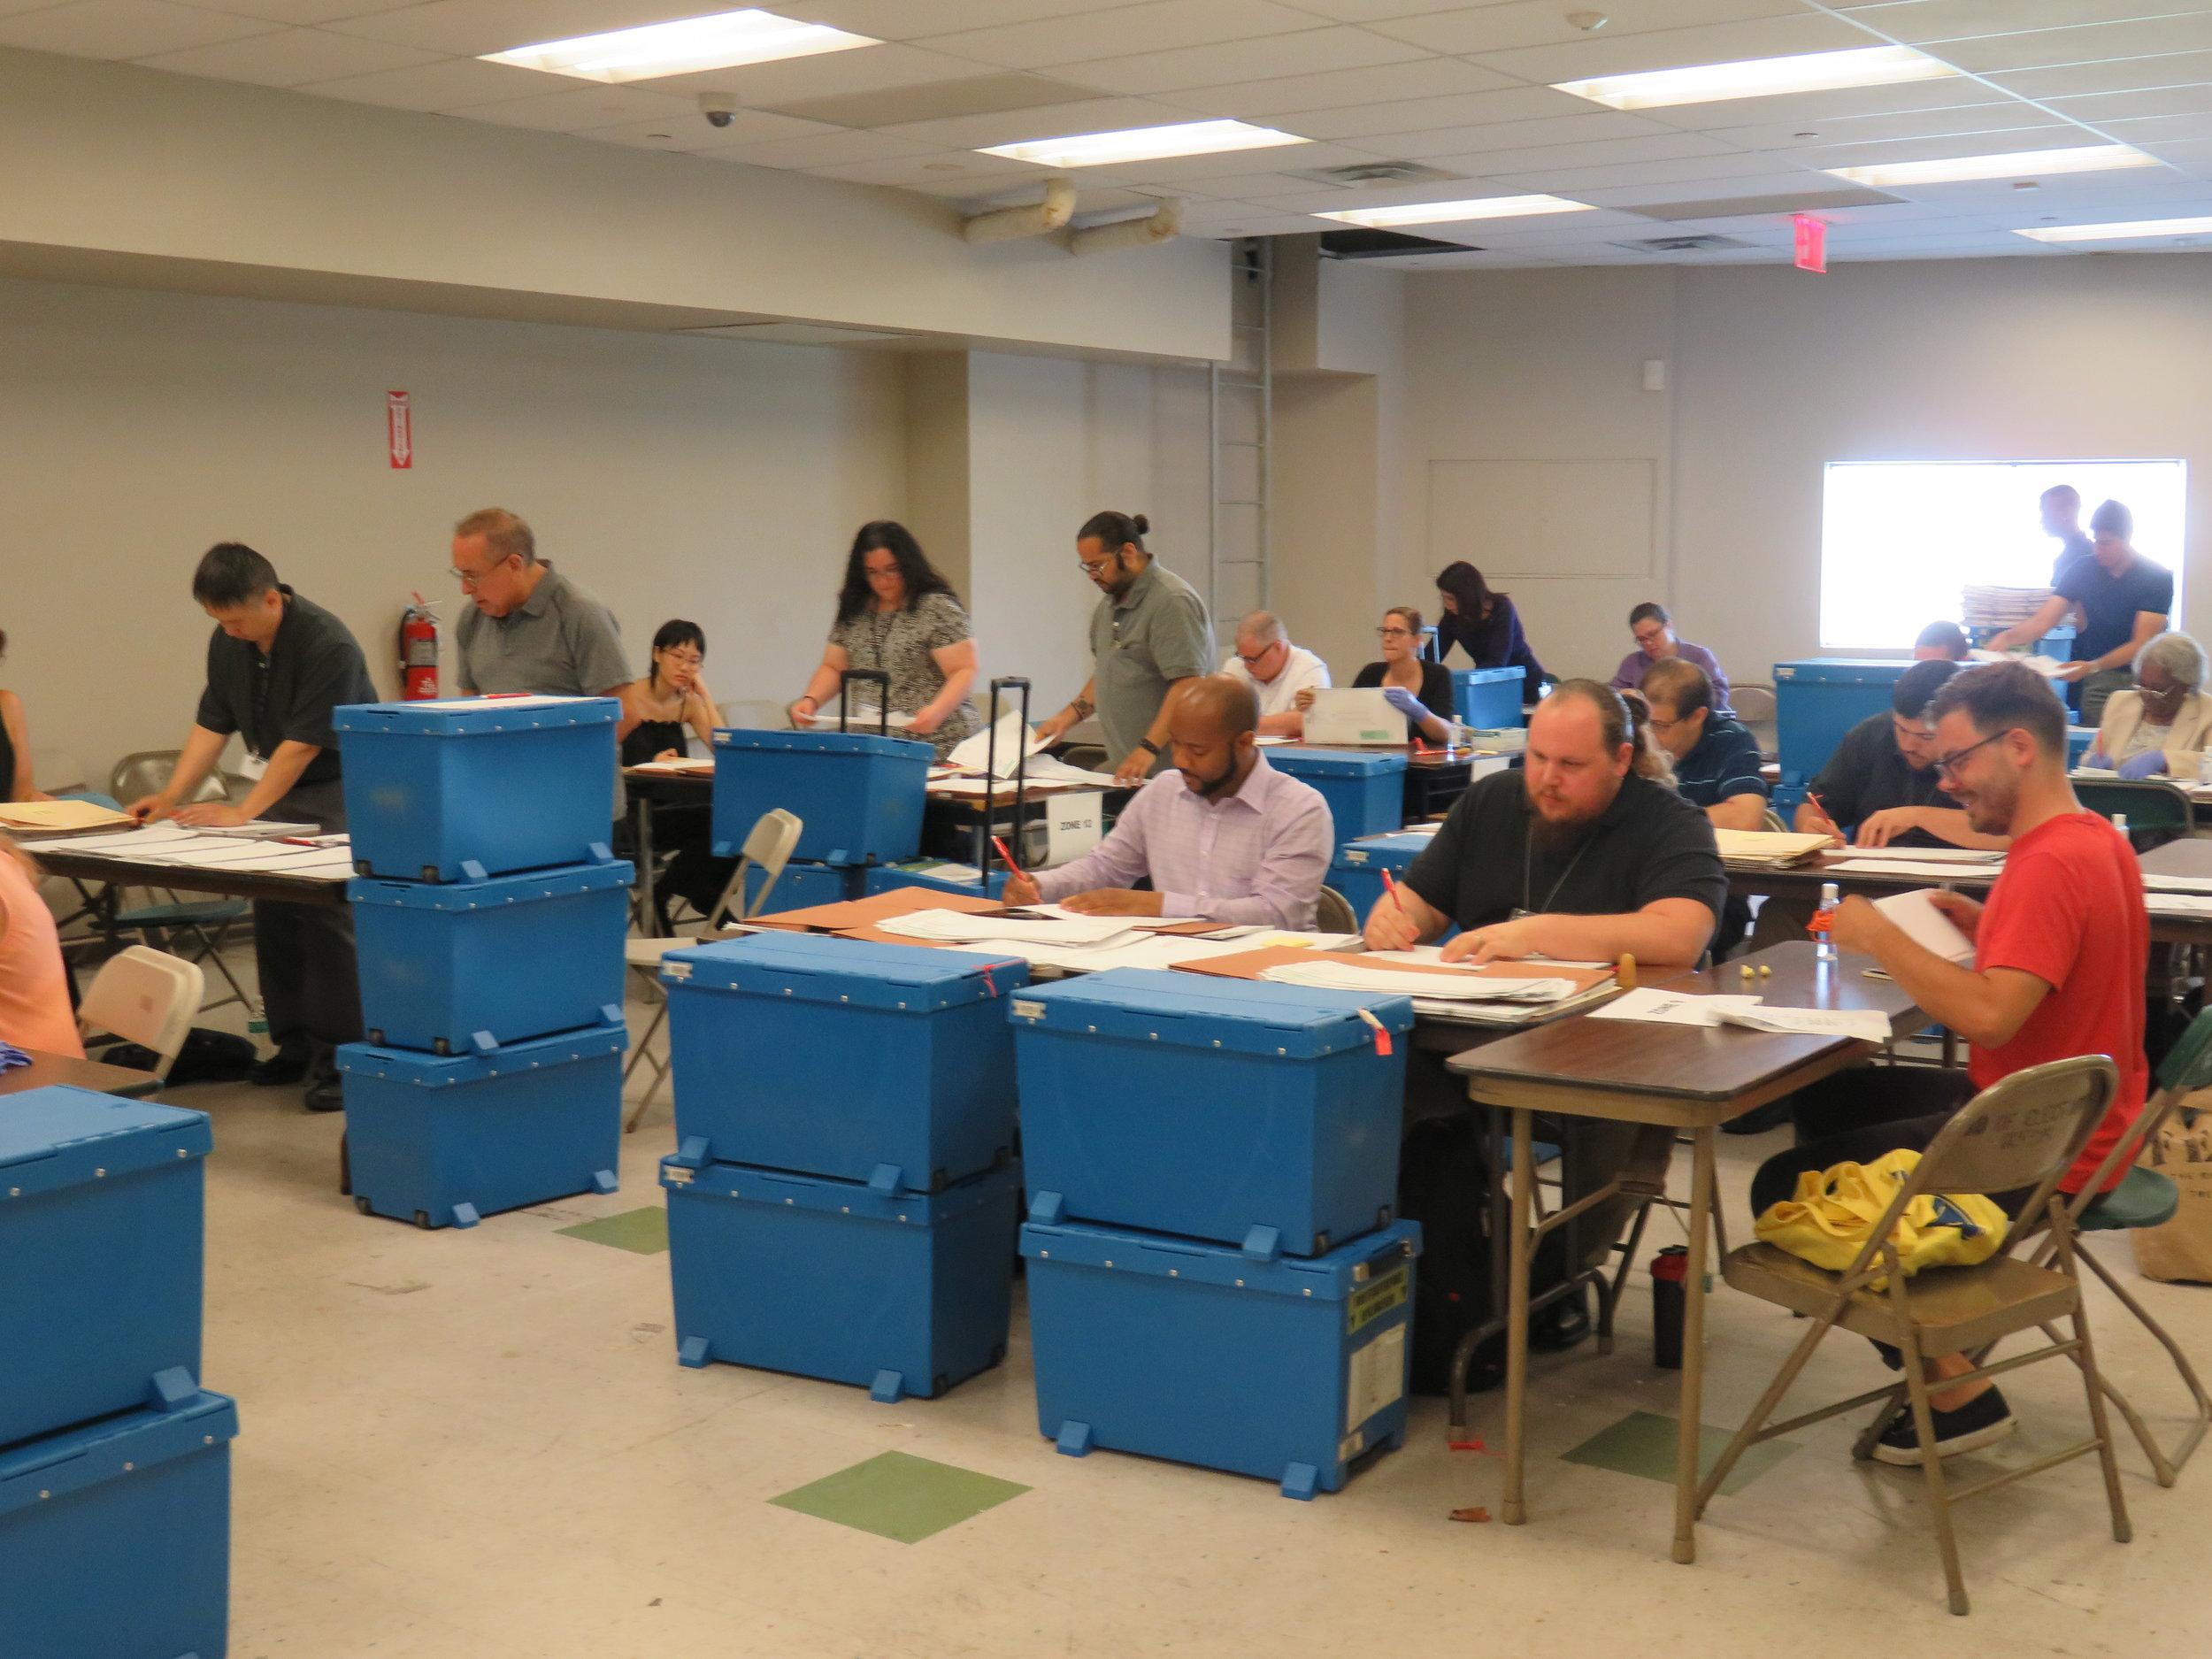 Ballots on ballots. Photo by David Brand